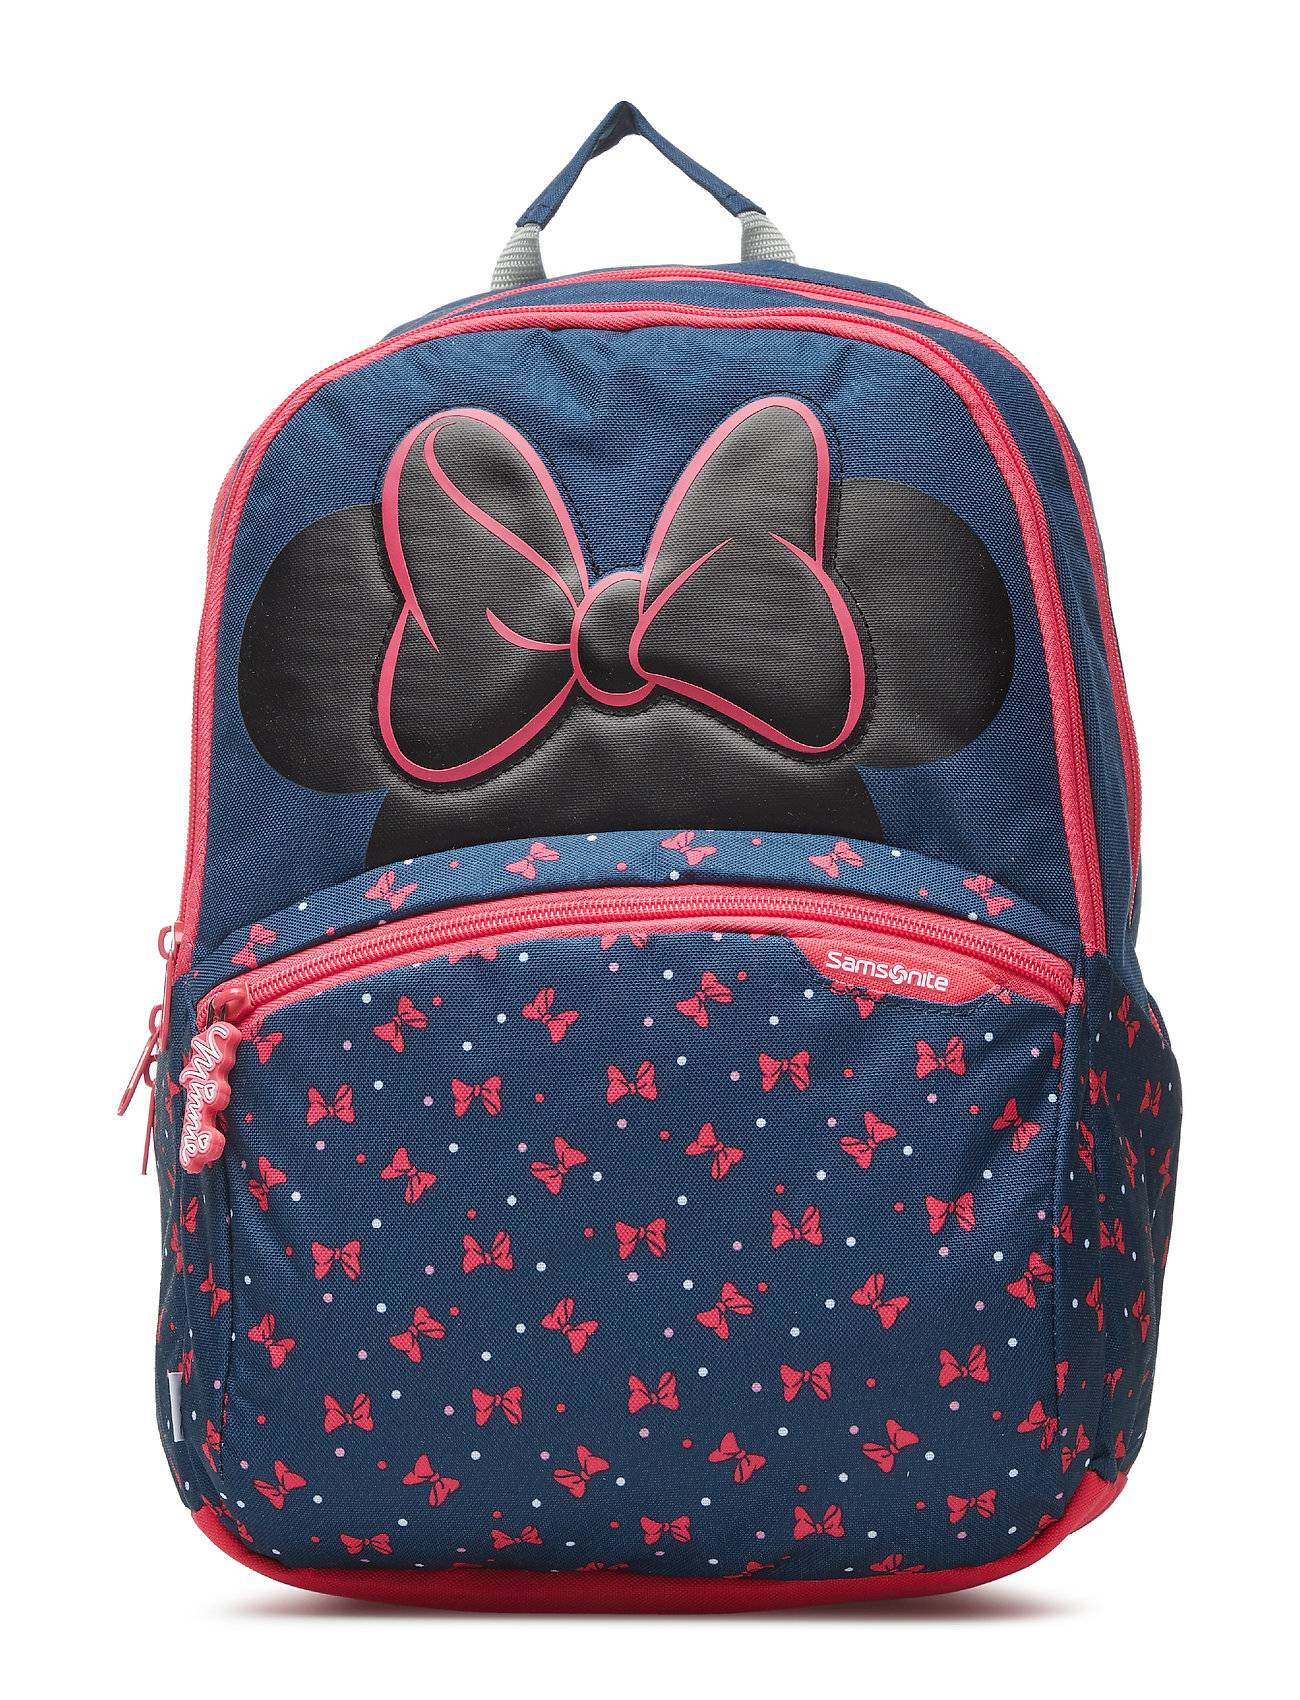 Samsonite Disney Tm Ultimate Backpack M